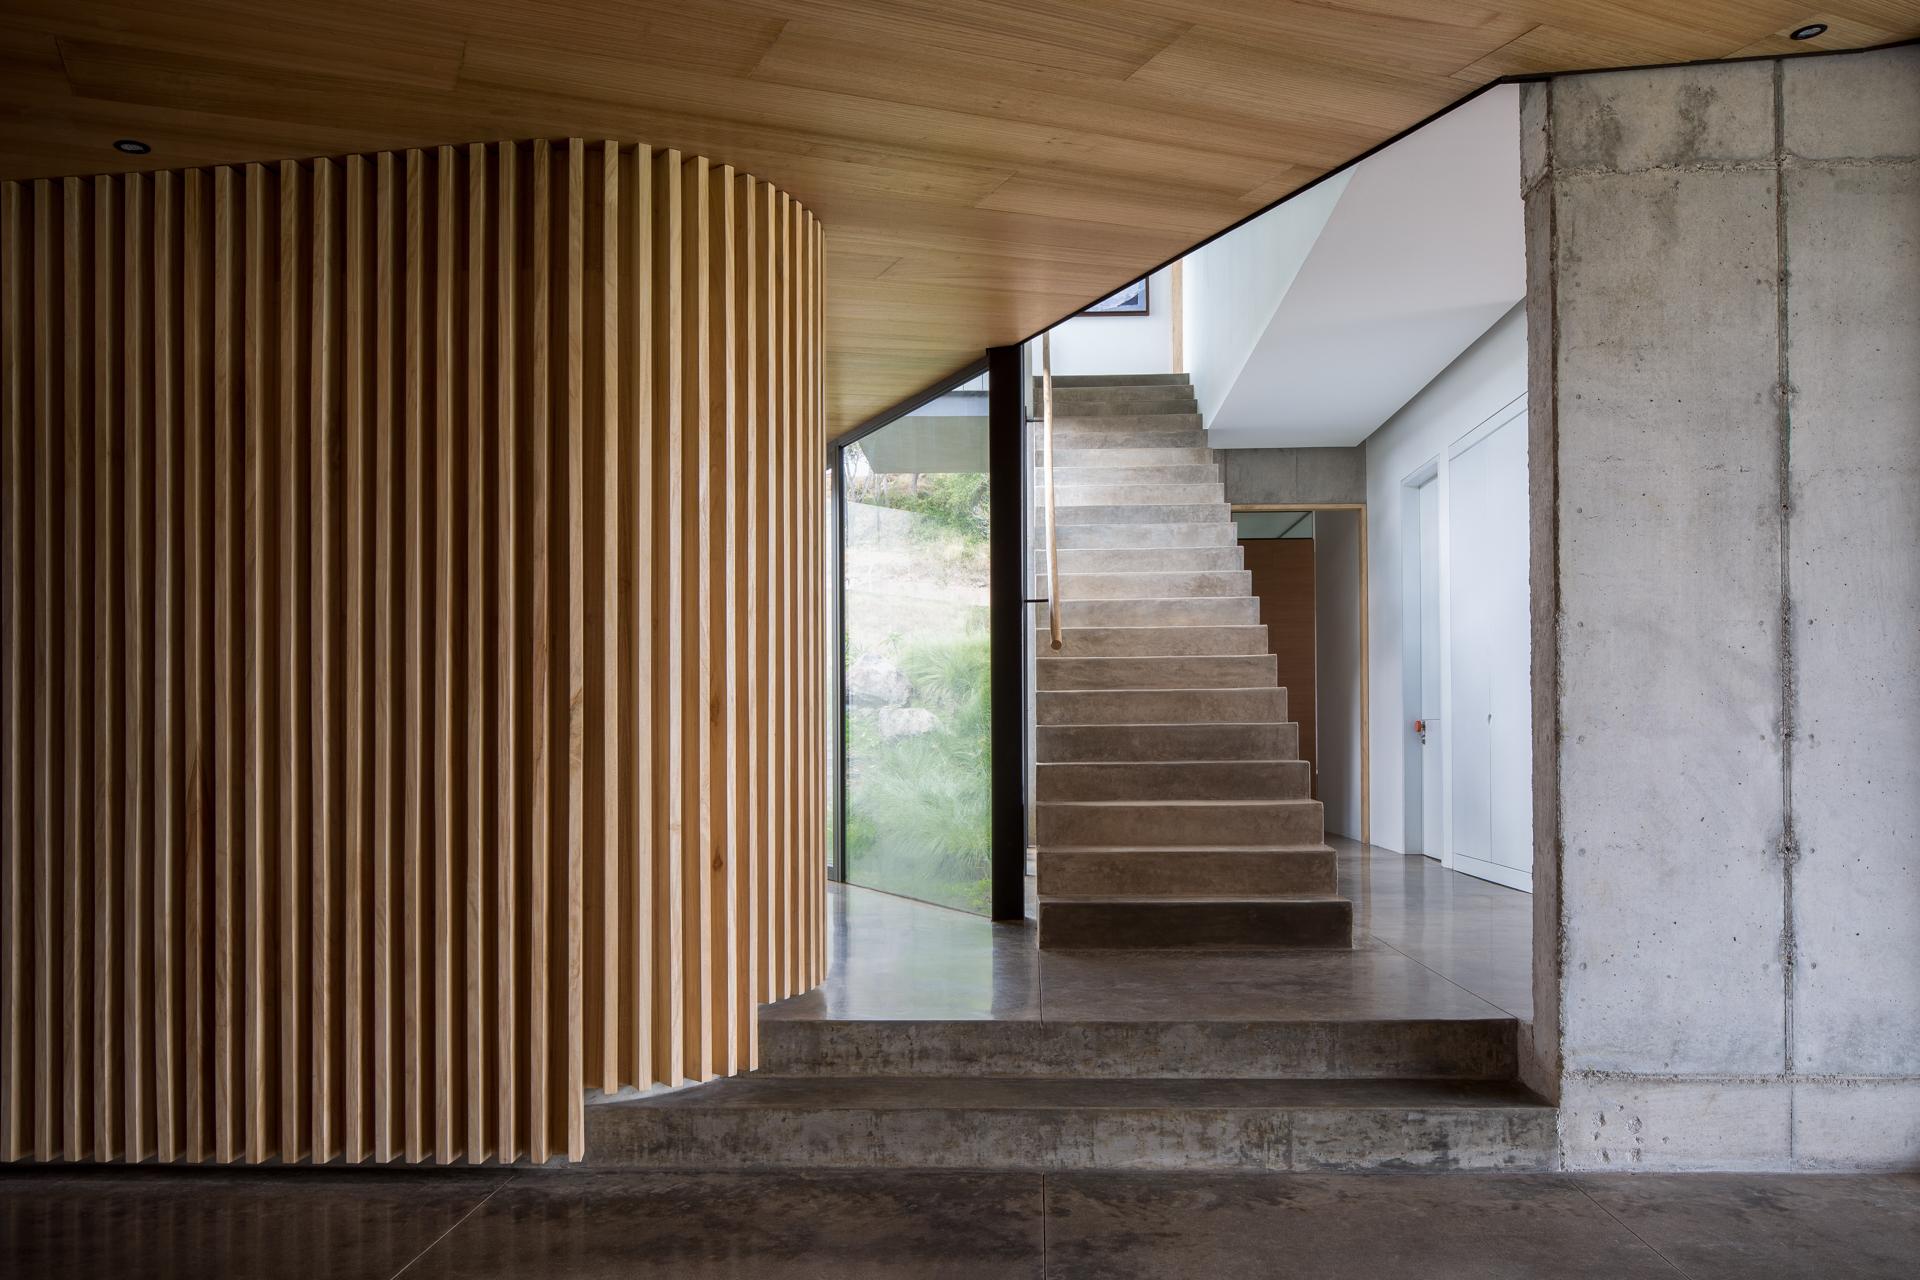 Architecture-Jason-Bax--3.JPG